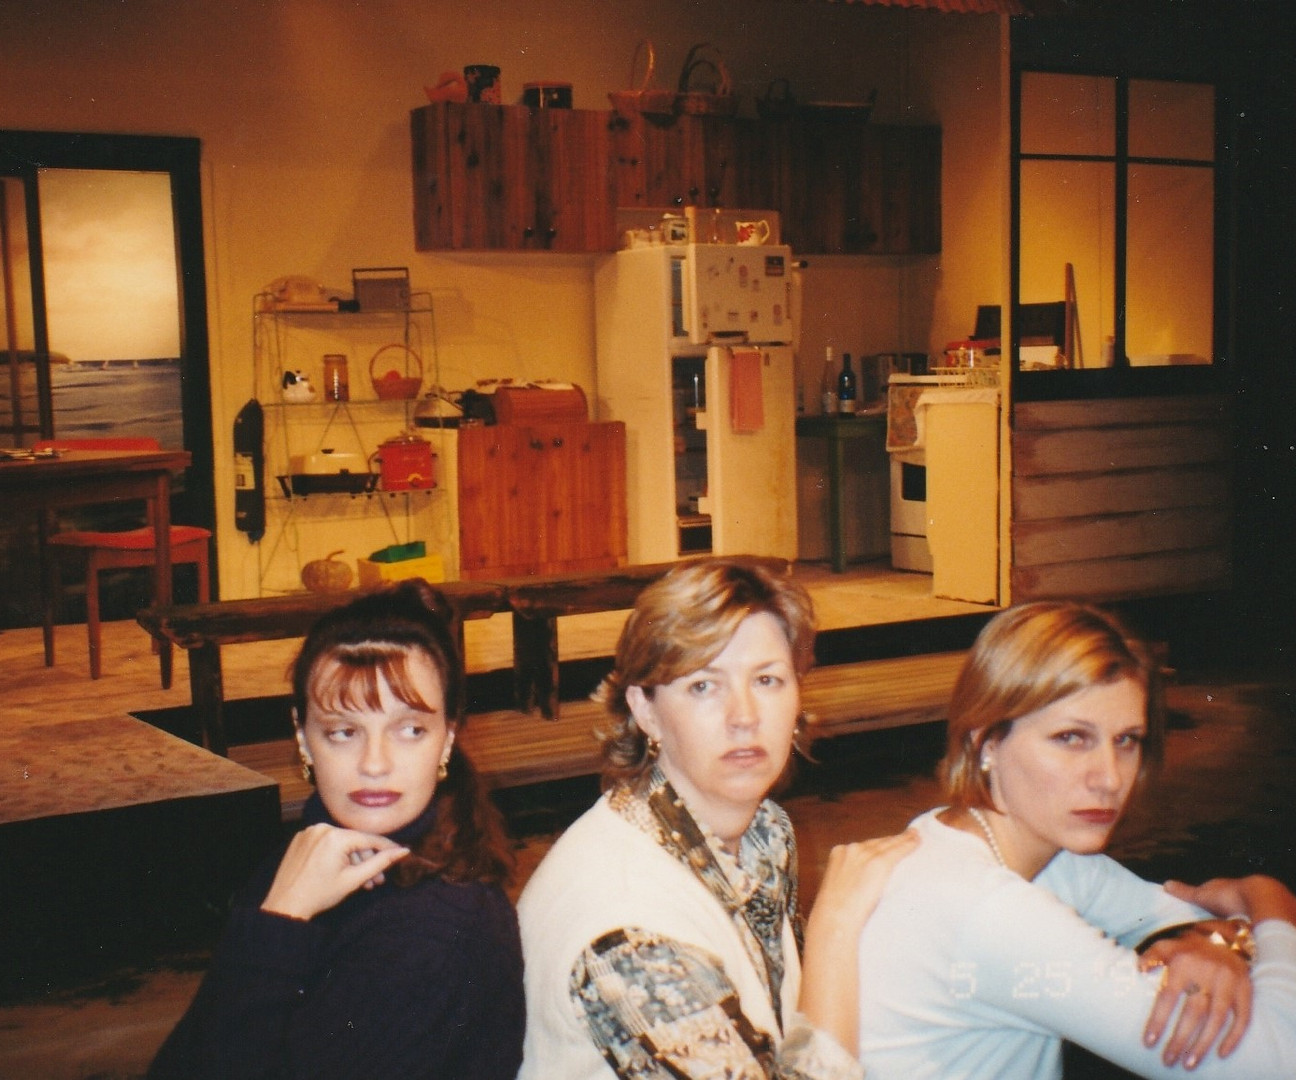 Hotel Sorrento 3 sisters